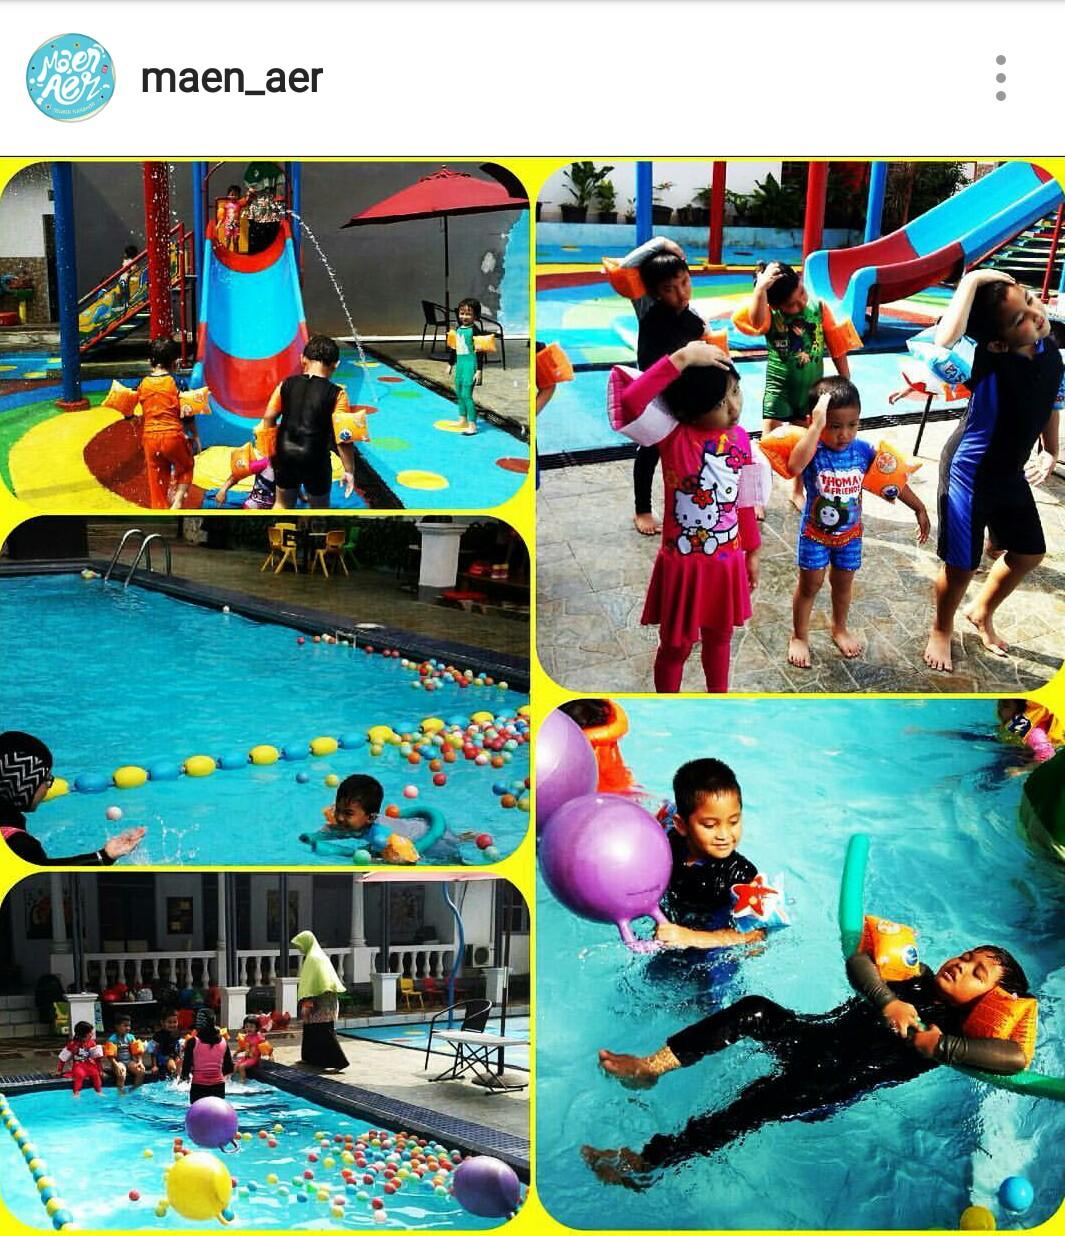 Maen Aer - Kids Holiday Spots - Liburan Anak - Informasi